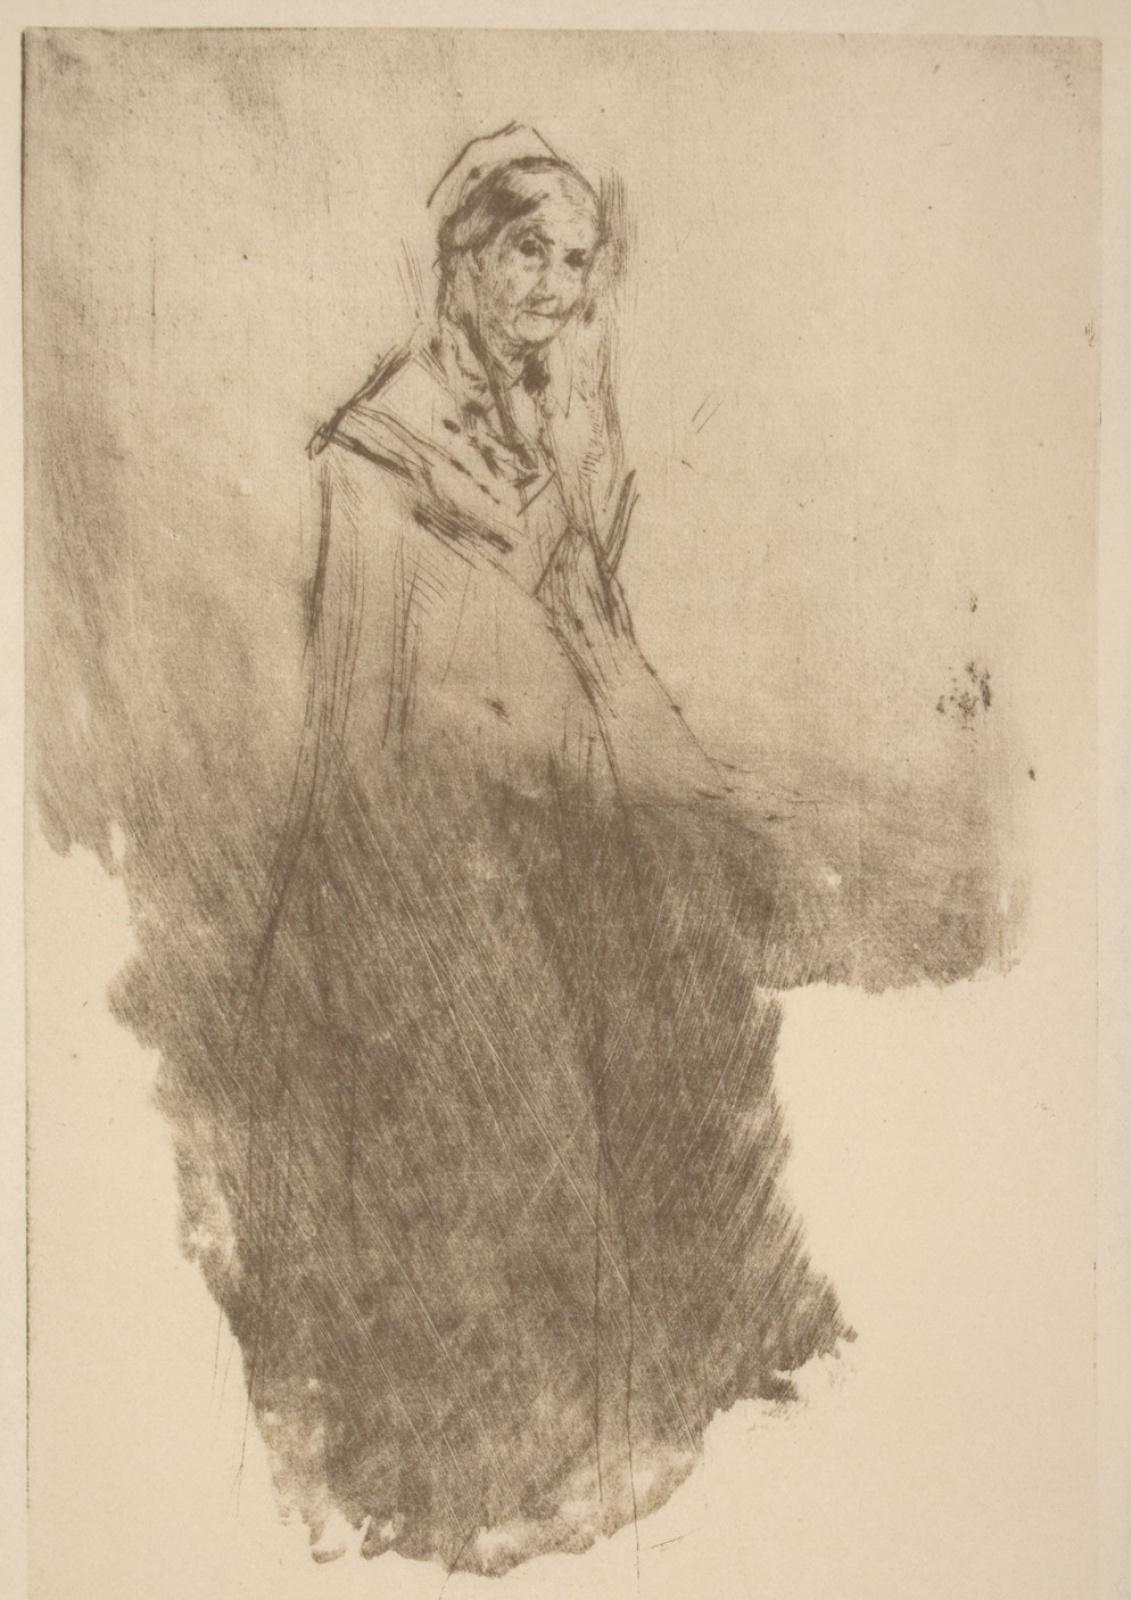 Джеймс Эббот Макнейл Уистлер. Мать художника, эскиз